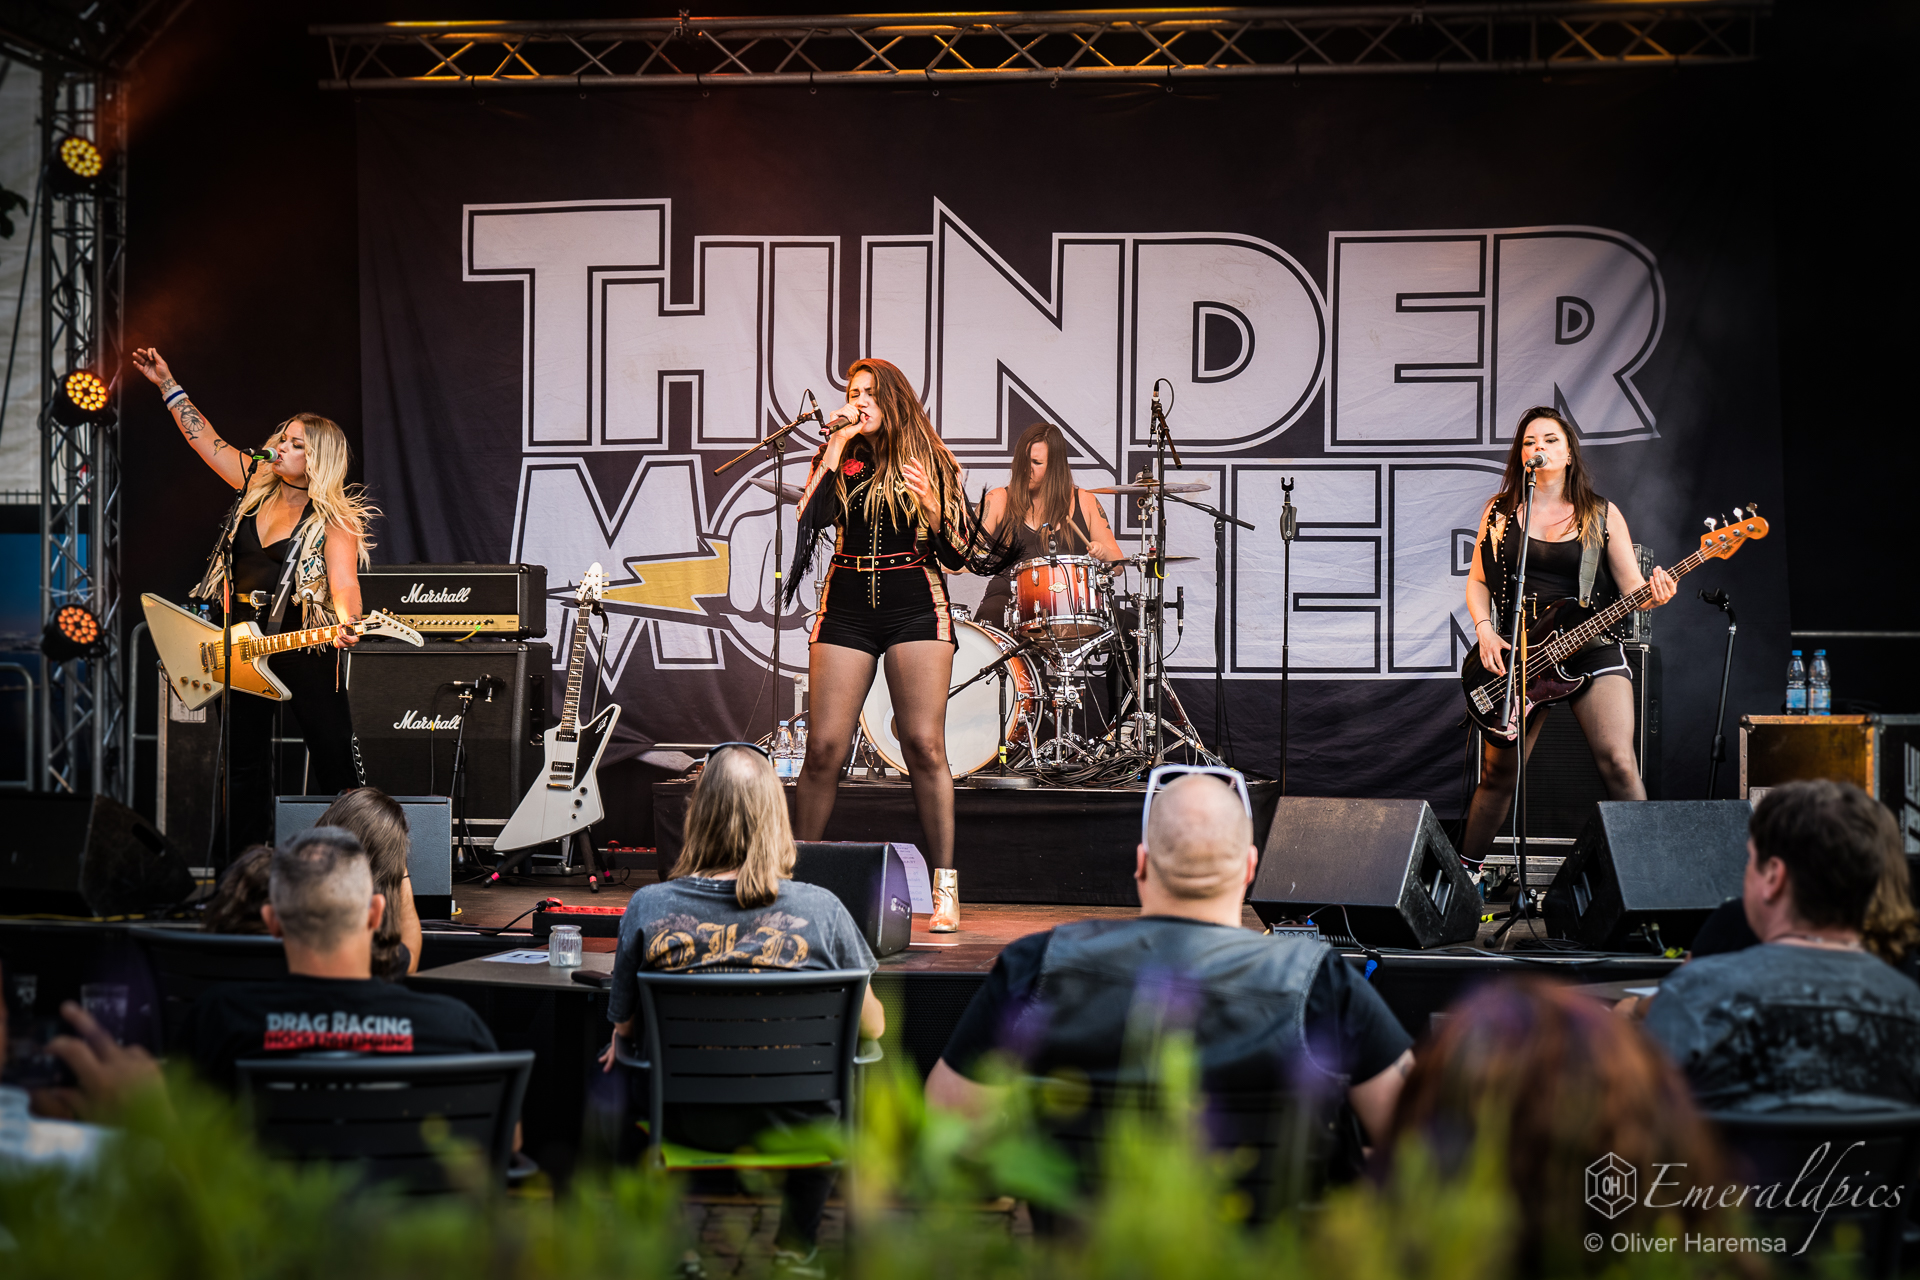 endlich-wieder-livemusik-in-the-real-world-review-zum-thundermother-gig-in-kaiserslautern